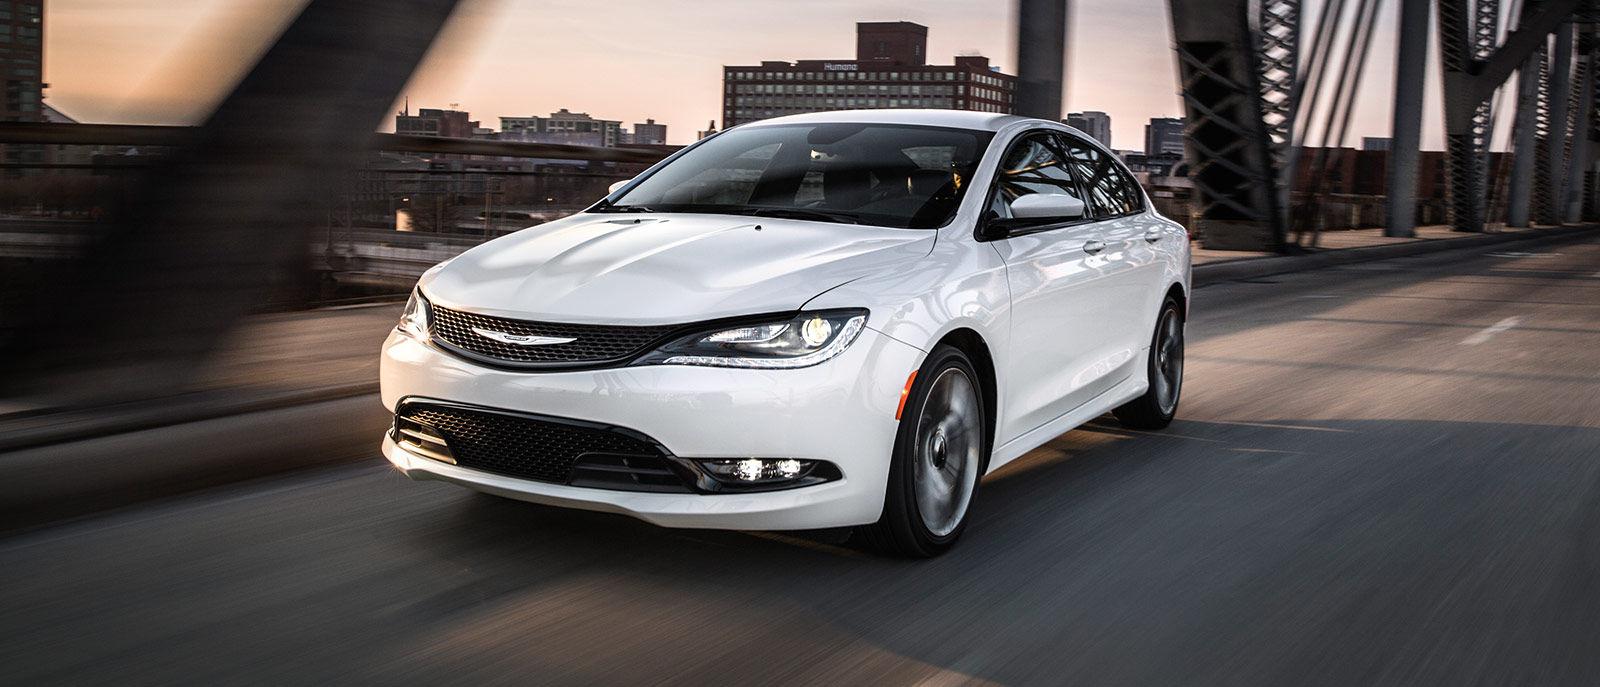 2016-Chrysler-200-two